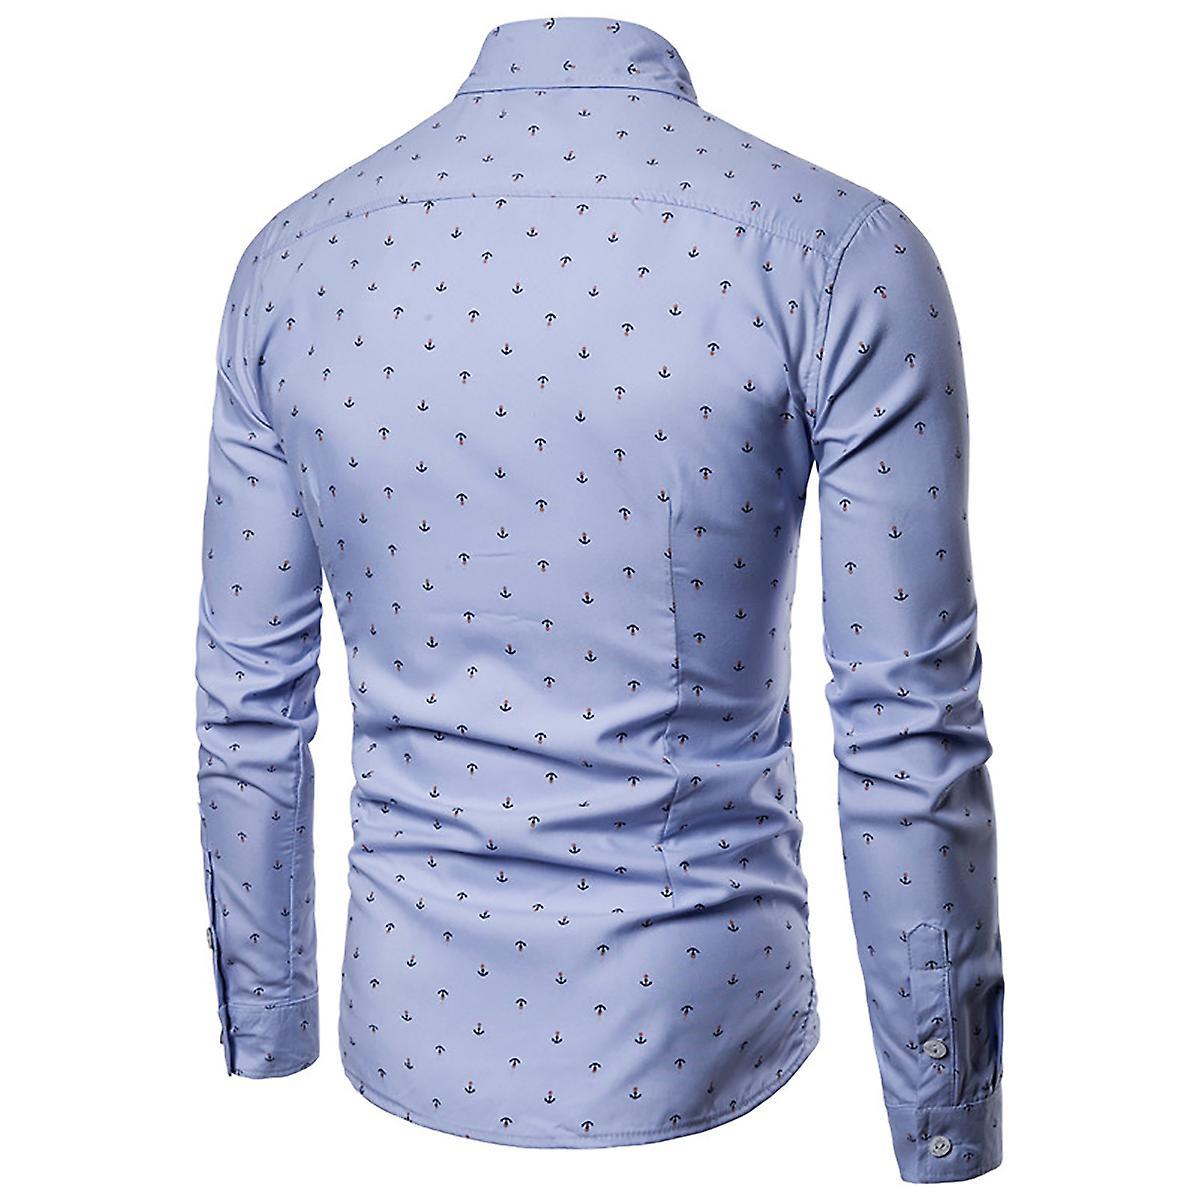 a316ed9e8 Allthemen Men's Long Sleeve Shirt Printed Anchor Cotton Blend Shirt 4 Colors